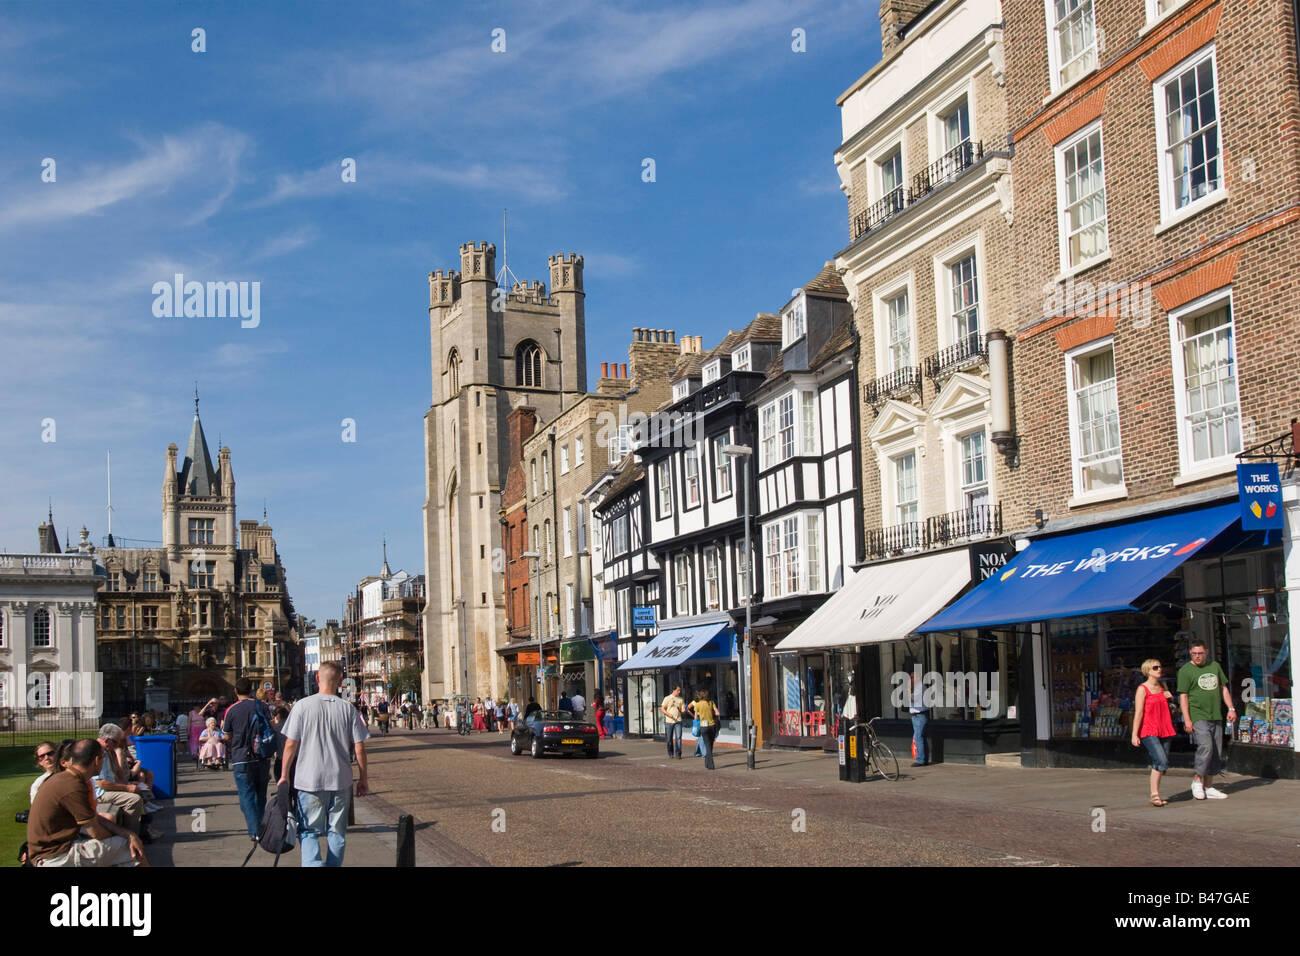 King's Parade Cambridge Cambs GB UK - Stock Image